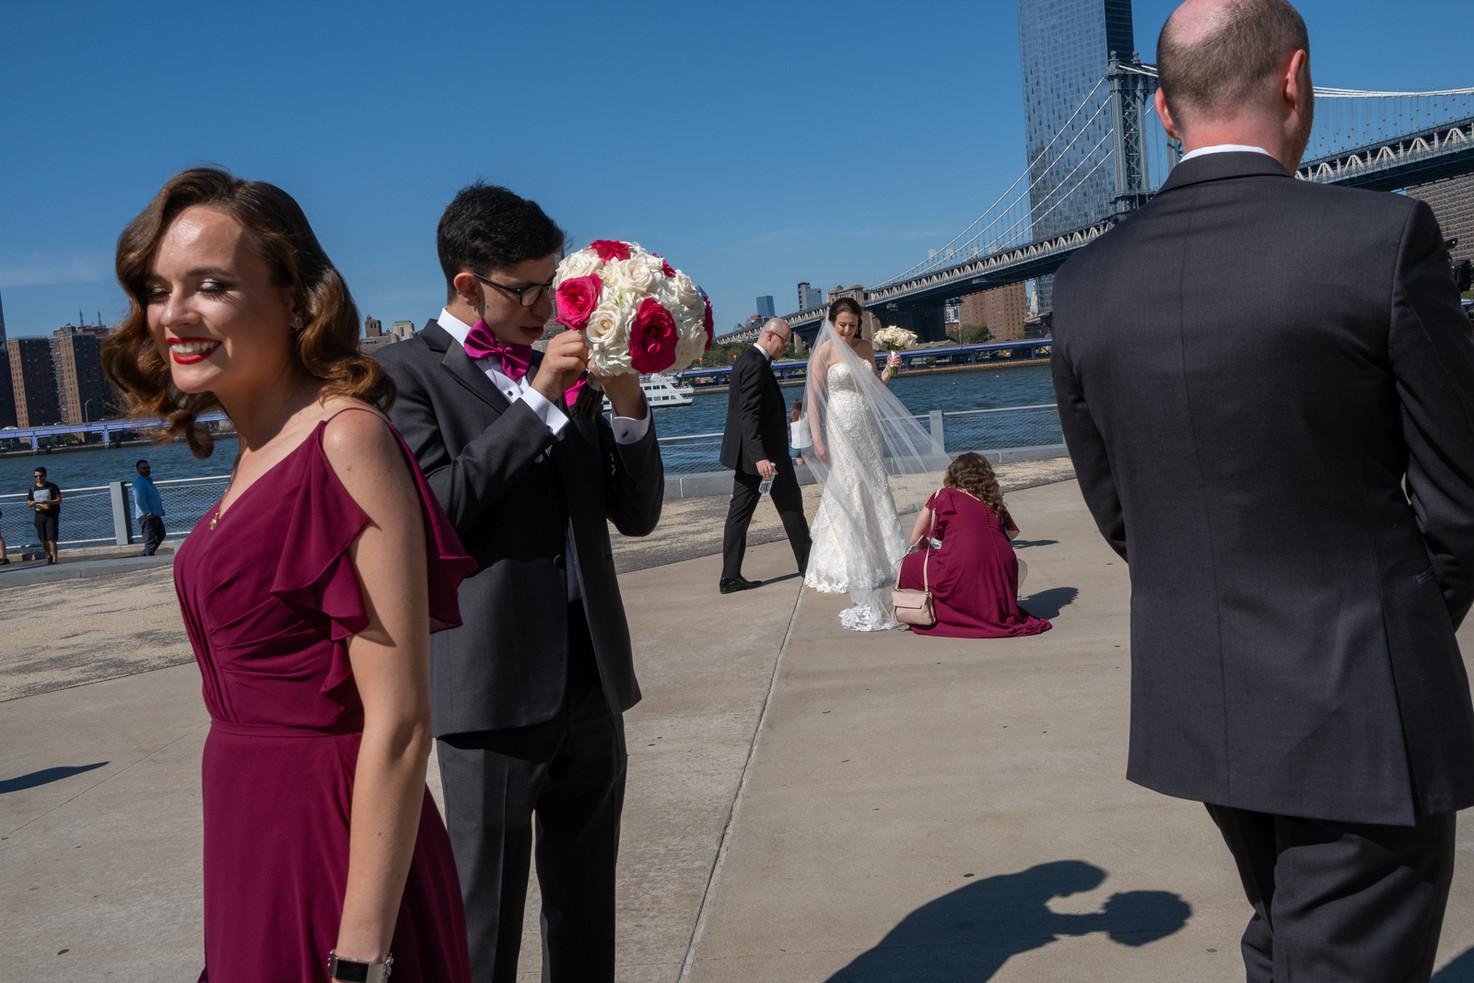 NYC_15_Brooklyn Bridge Park Wedding Park